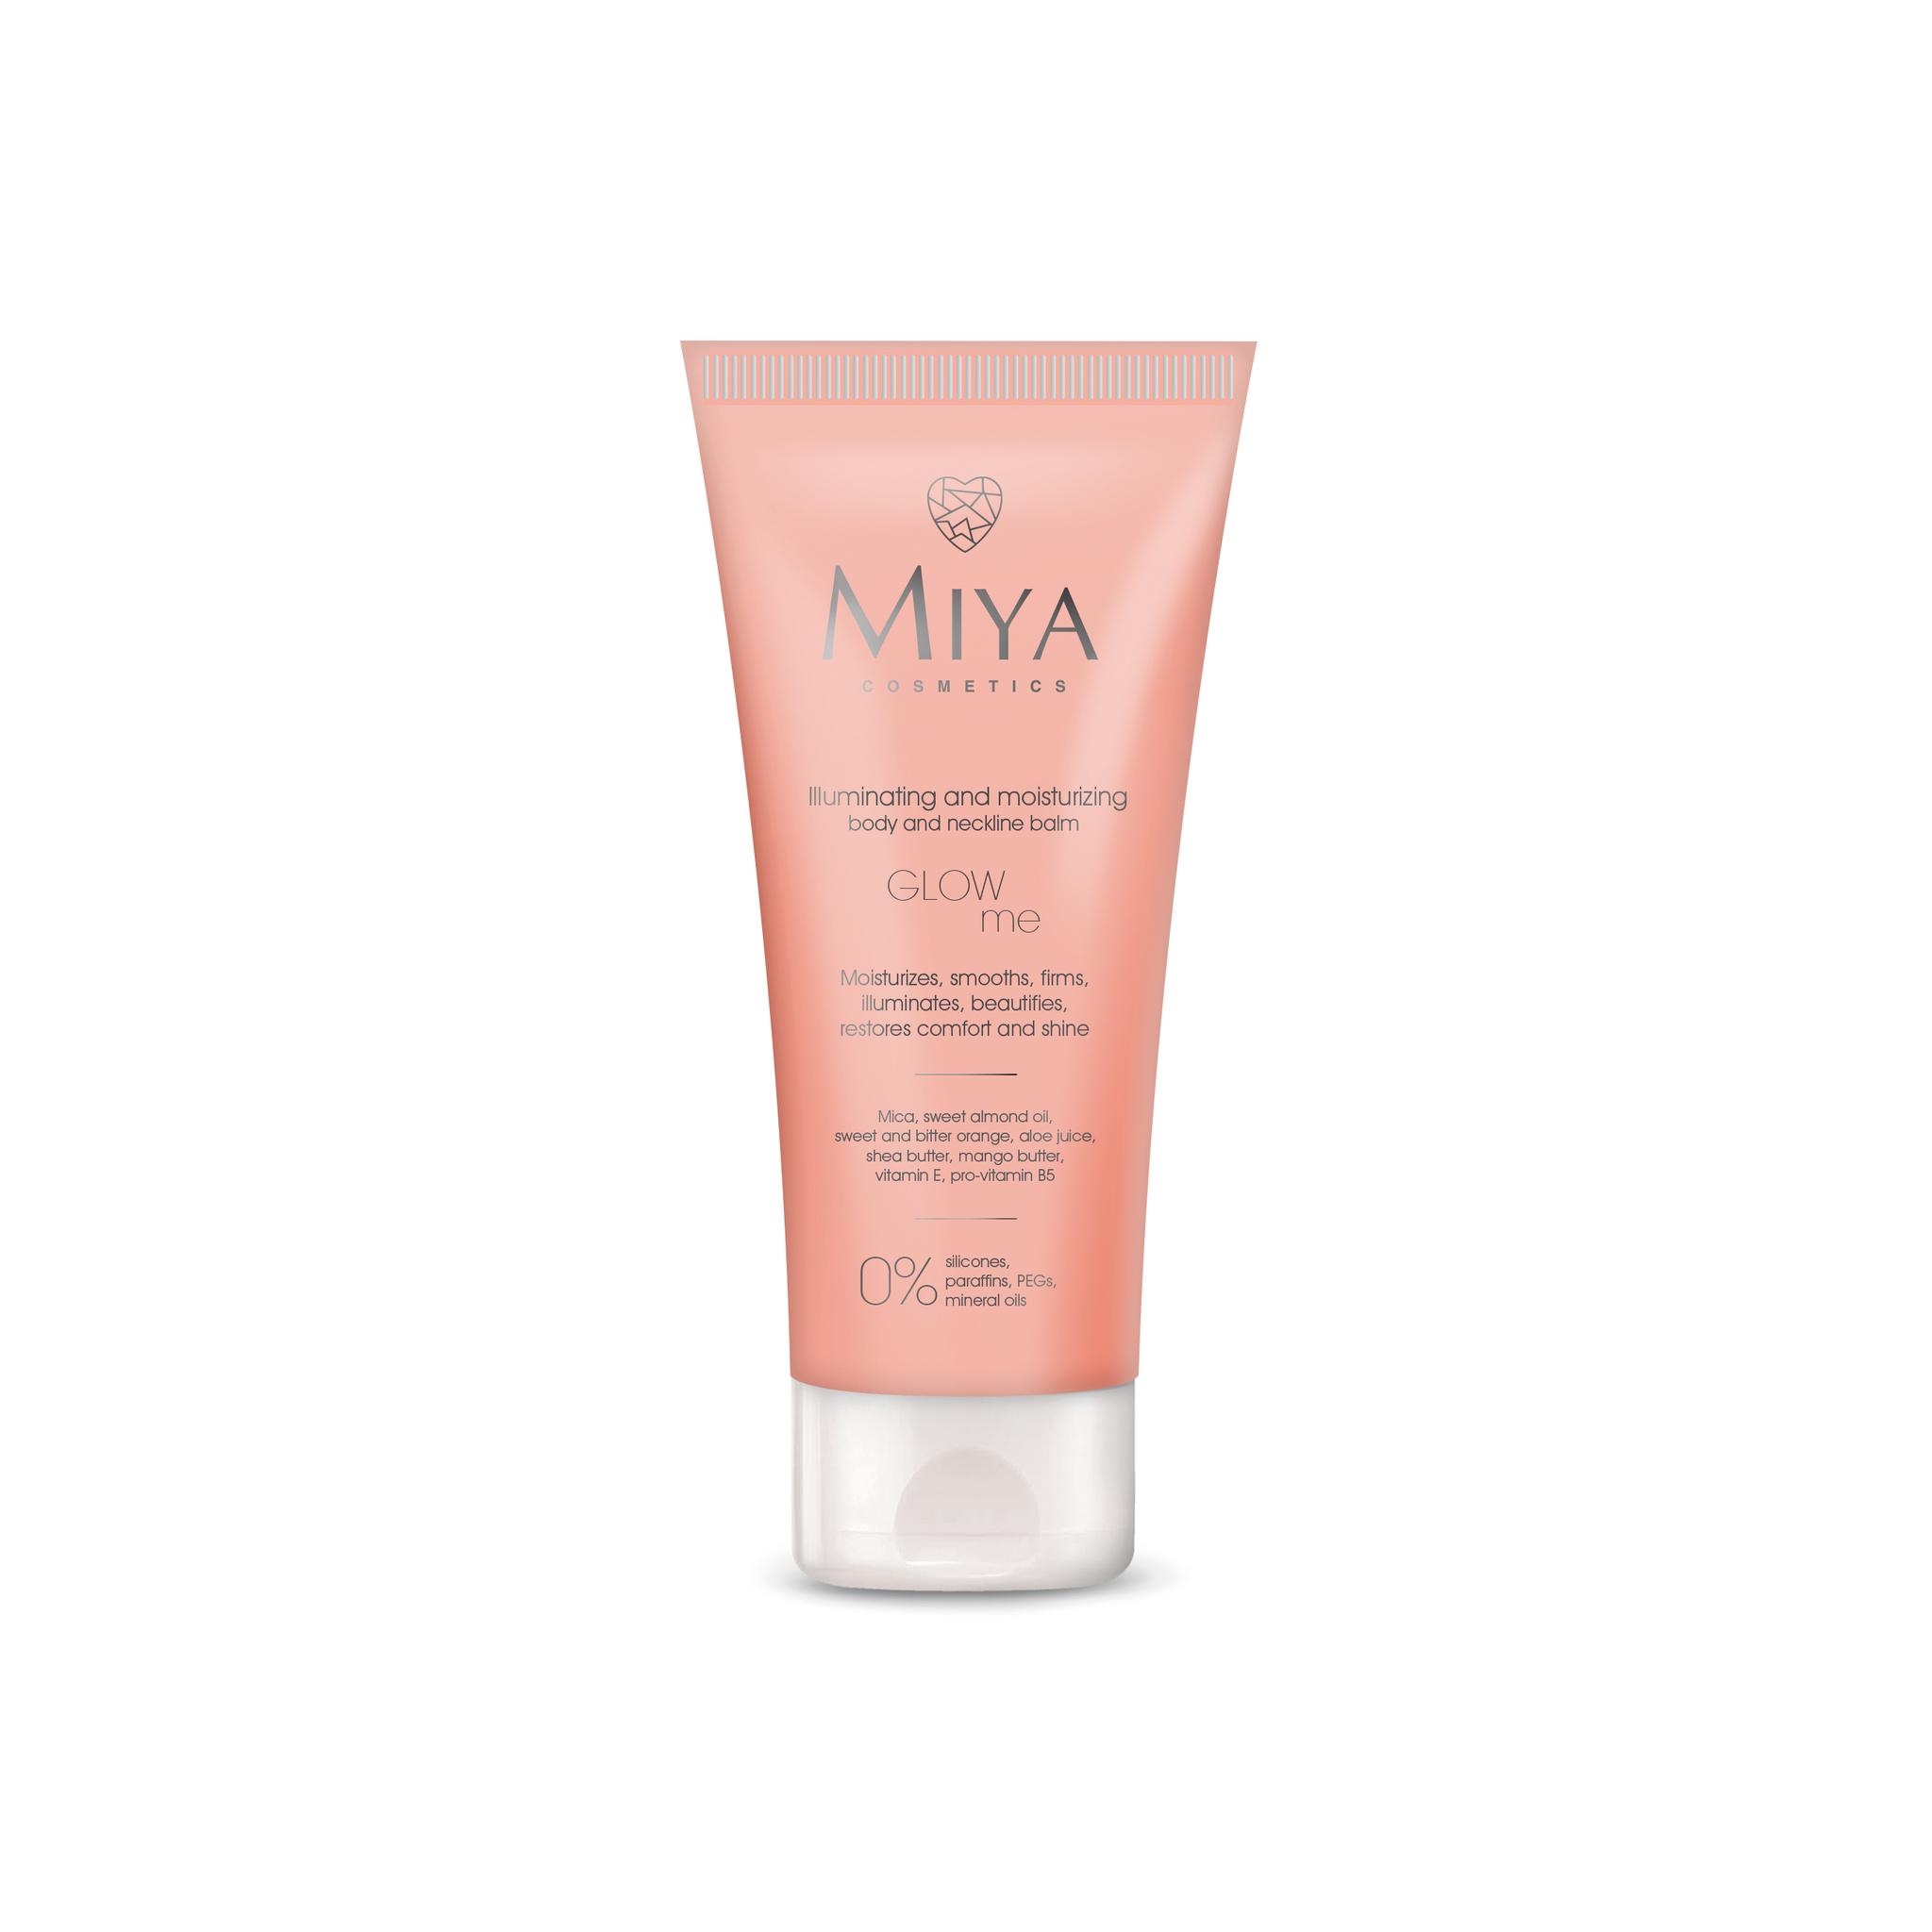 GLOWme de MIYA Cosmetics (precio: 10,99 euros)